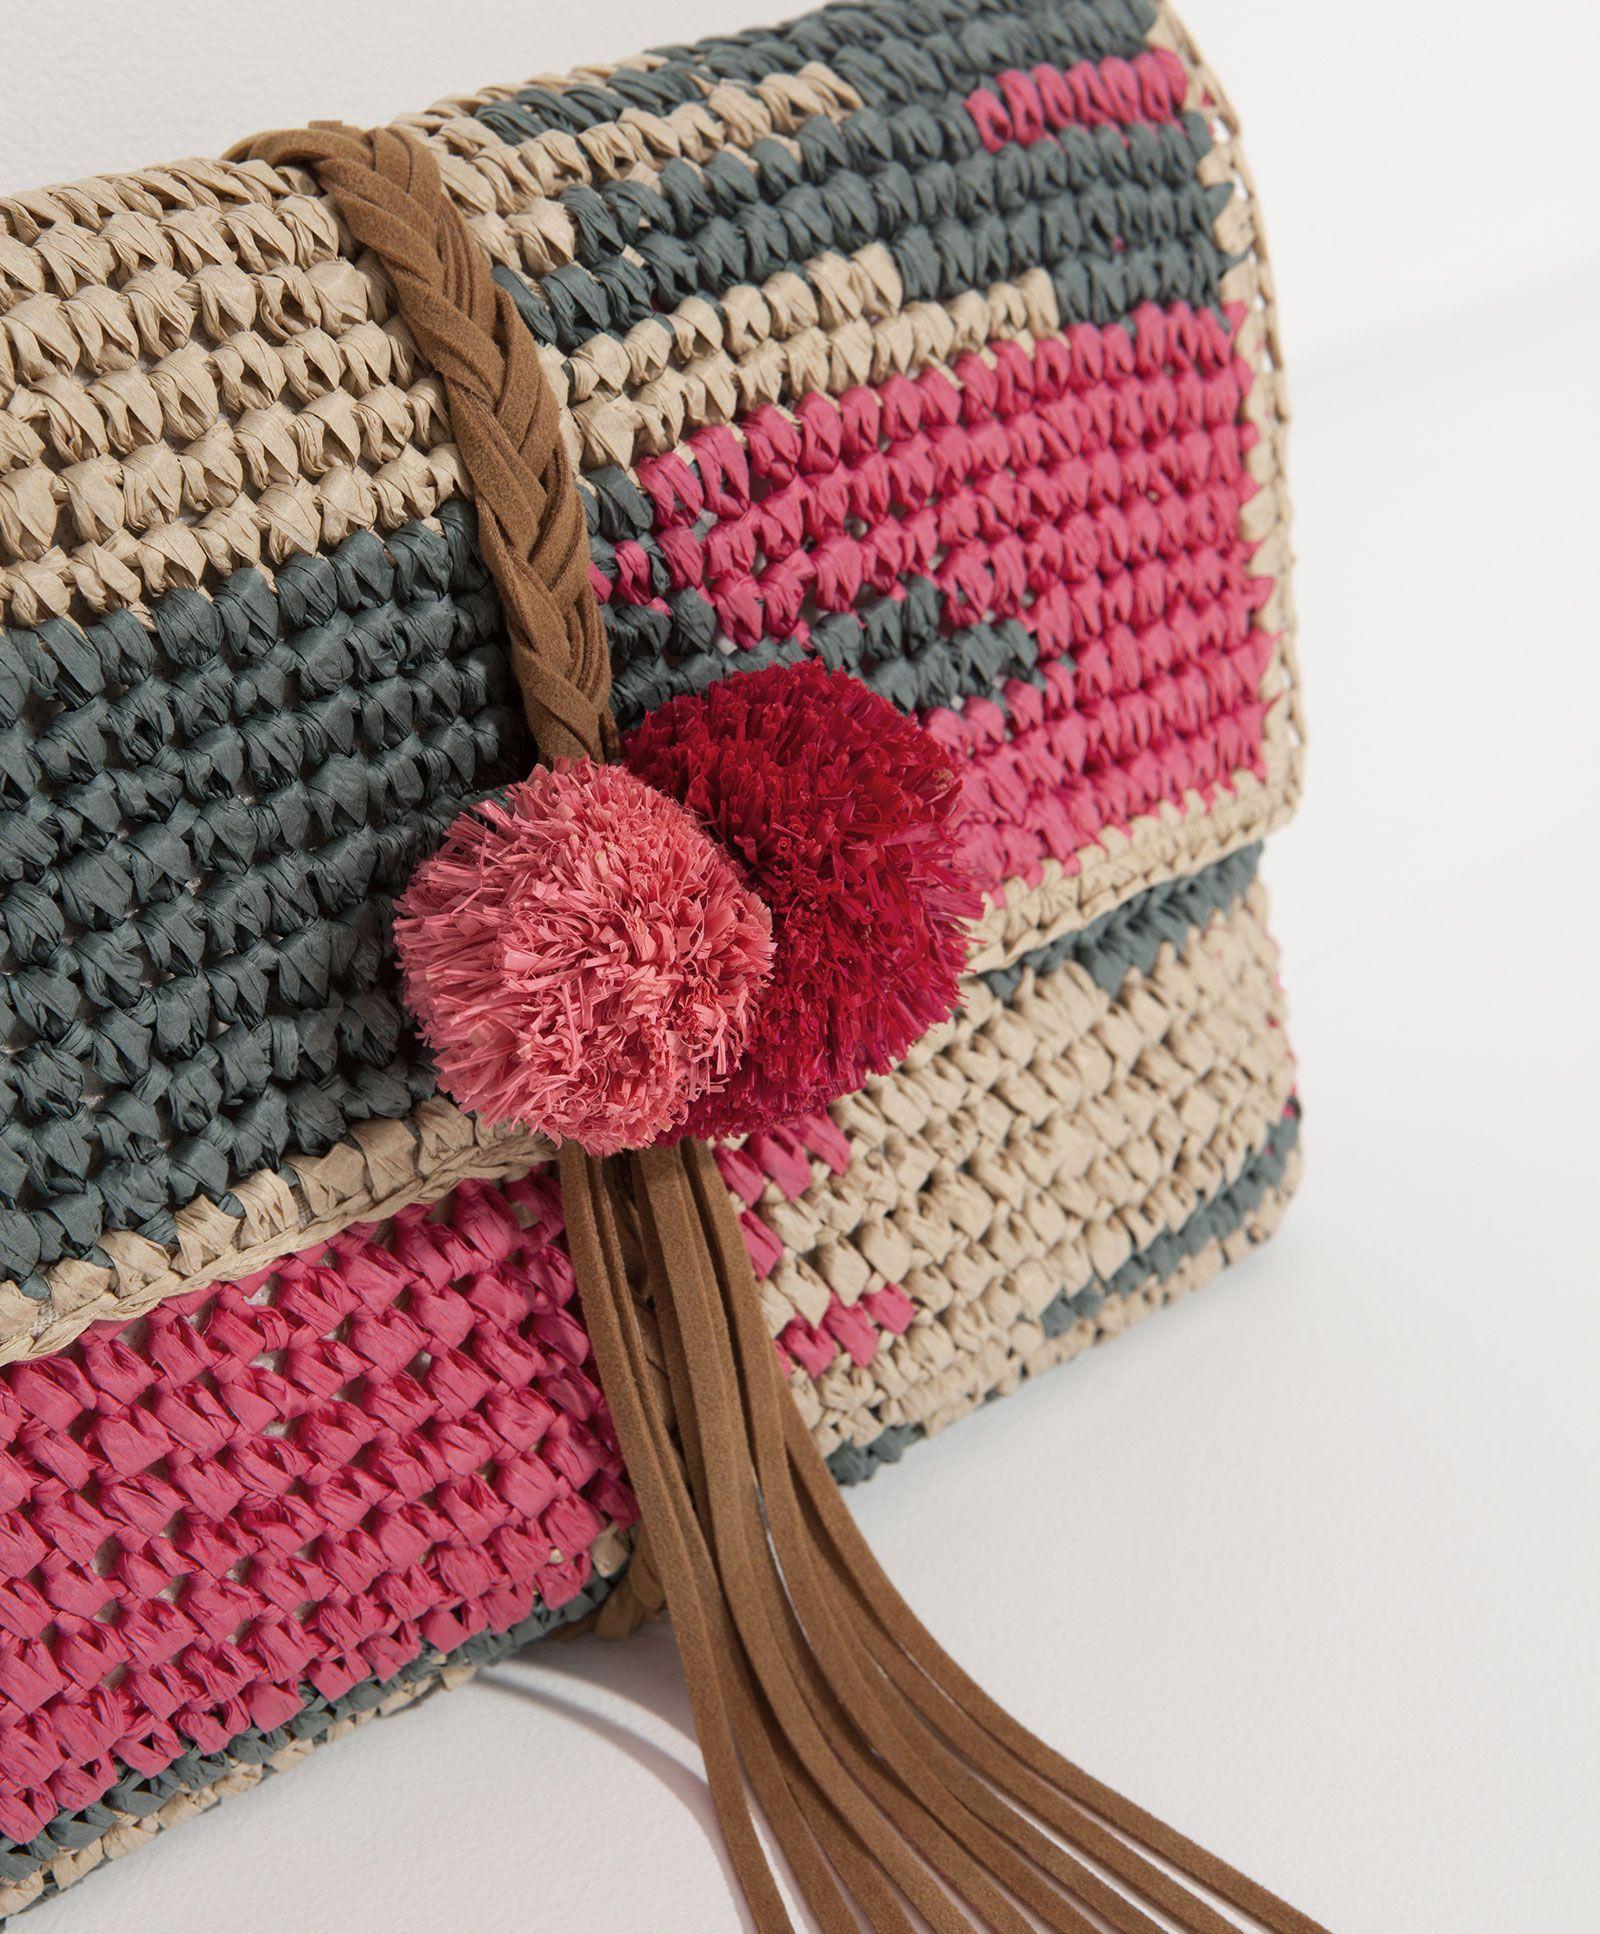 Clucht cartera de mano a crochet con rafia y adornado - Bolsos tejidos a crochet ...